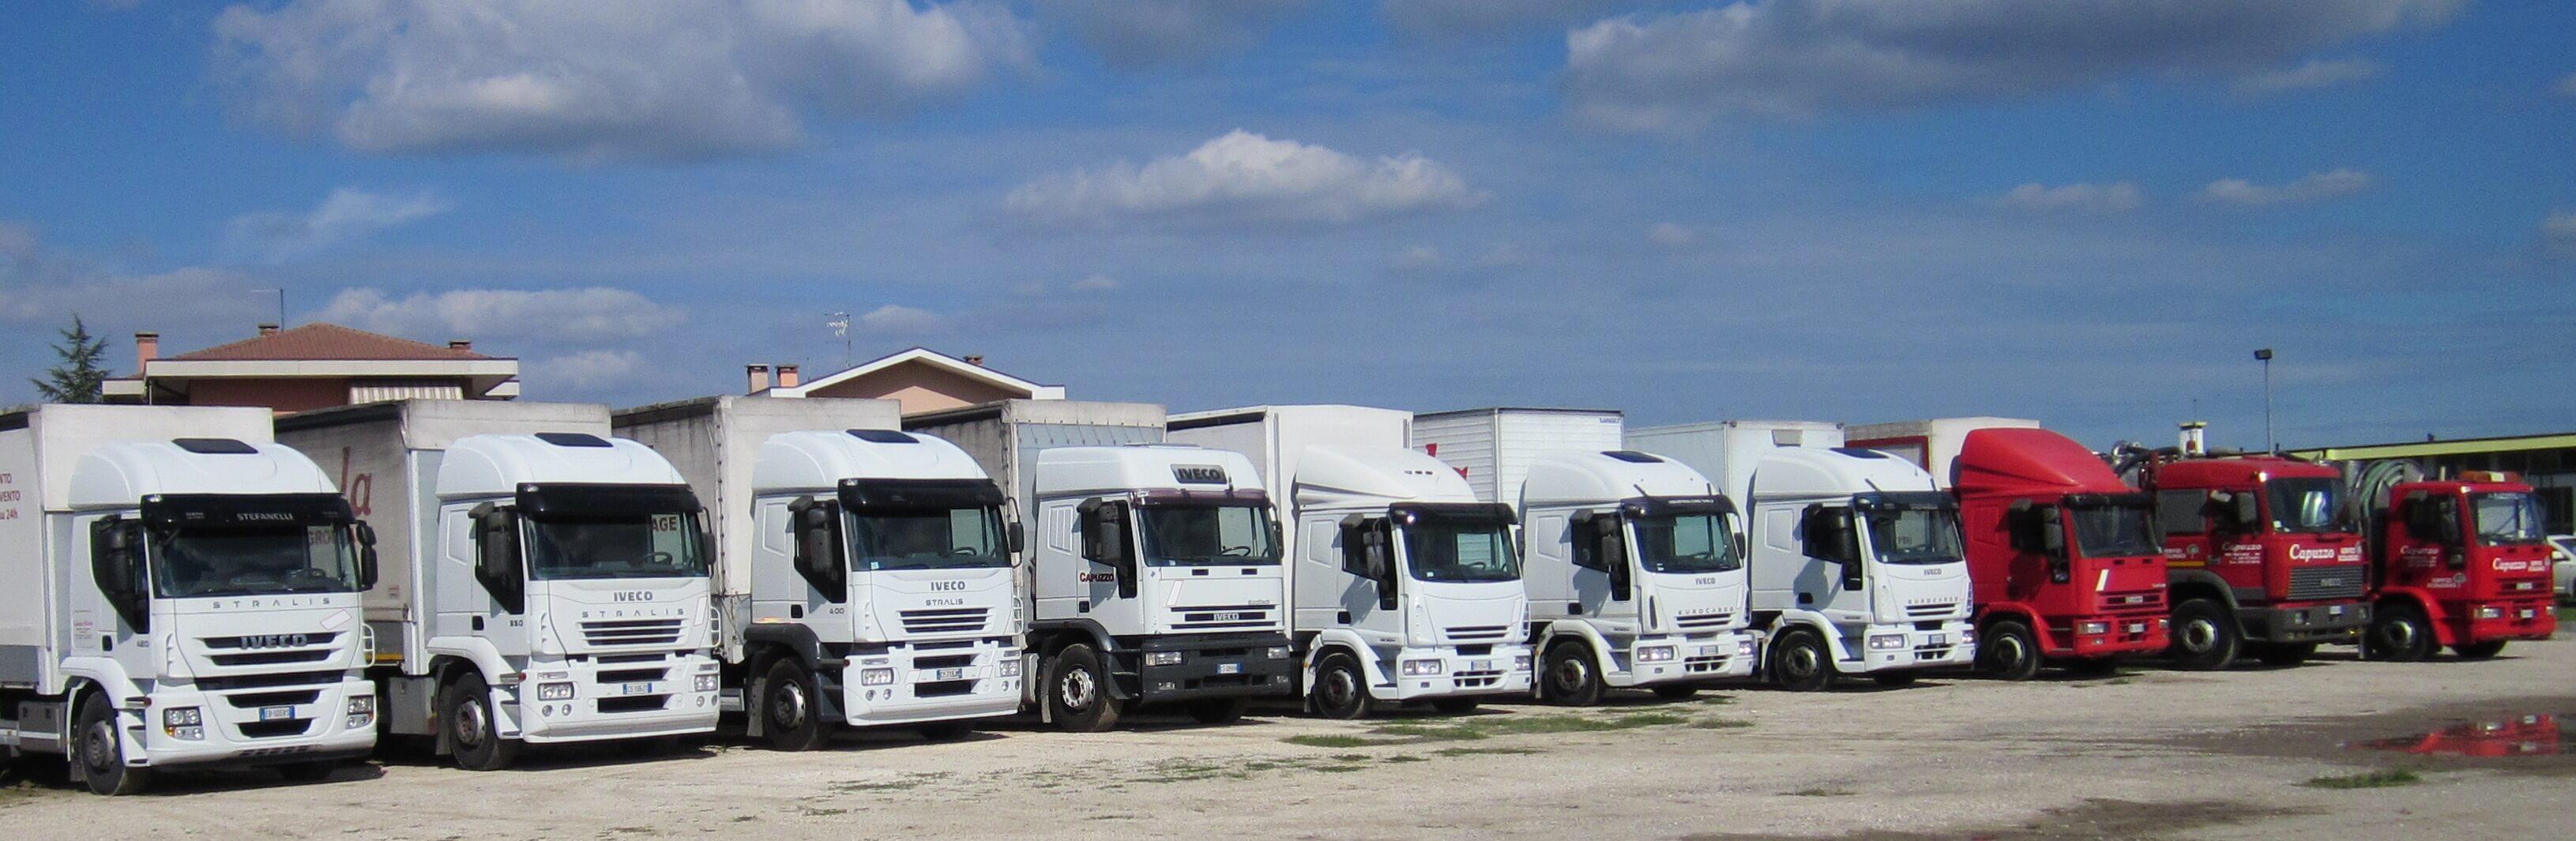 camion autotrasporti STS a Pontelongo